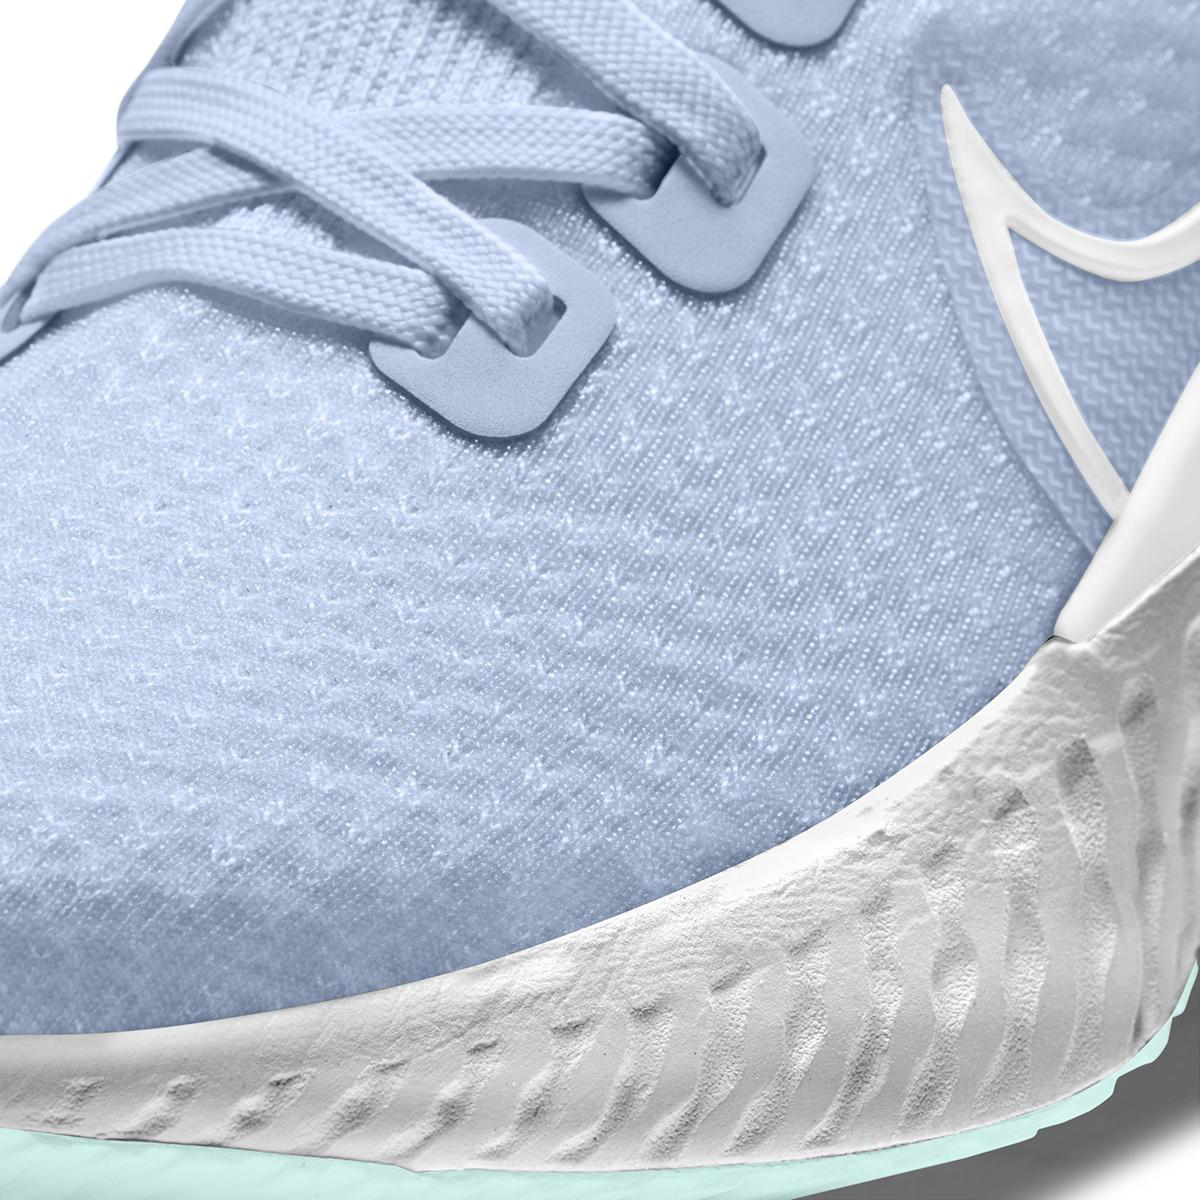 Women's Nike React Infinity Run Flyknit Running Shoe - Color: Hydrogen Blue/Teal Tint/Metallic Silver/White (Regular Width) - Size: 5, Hydrogen Blue/Teal Tint/Metallic Silver/White, large, image 4